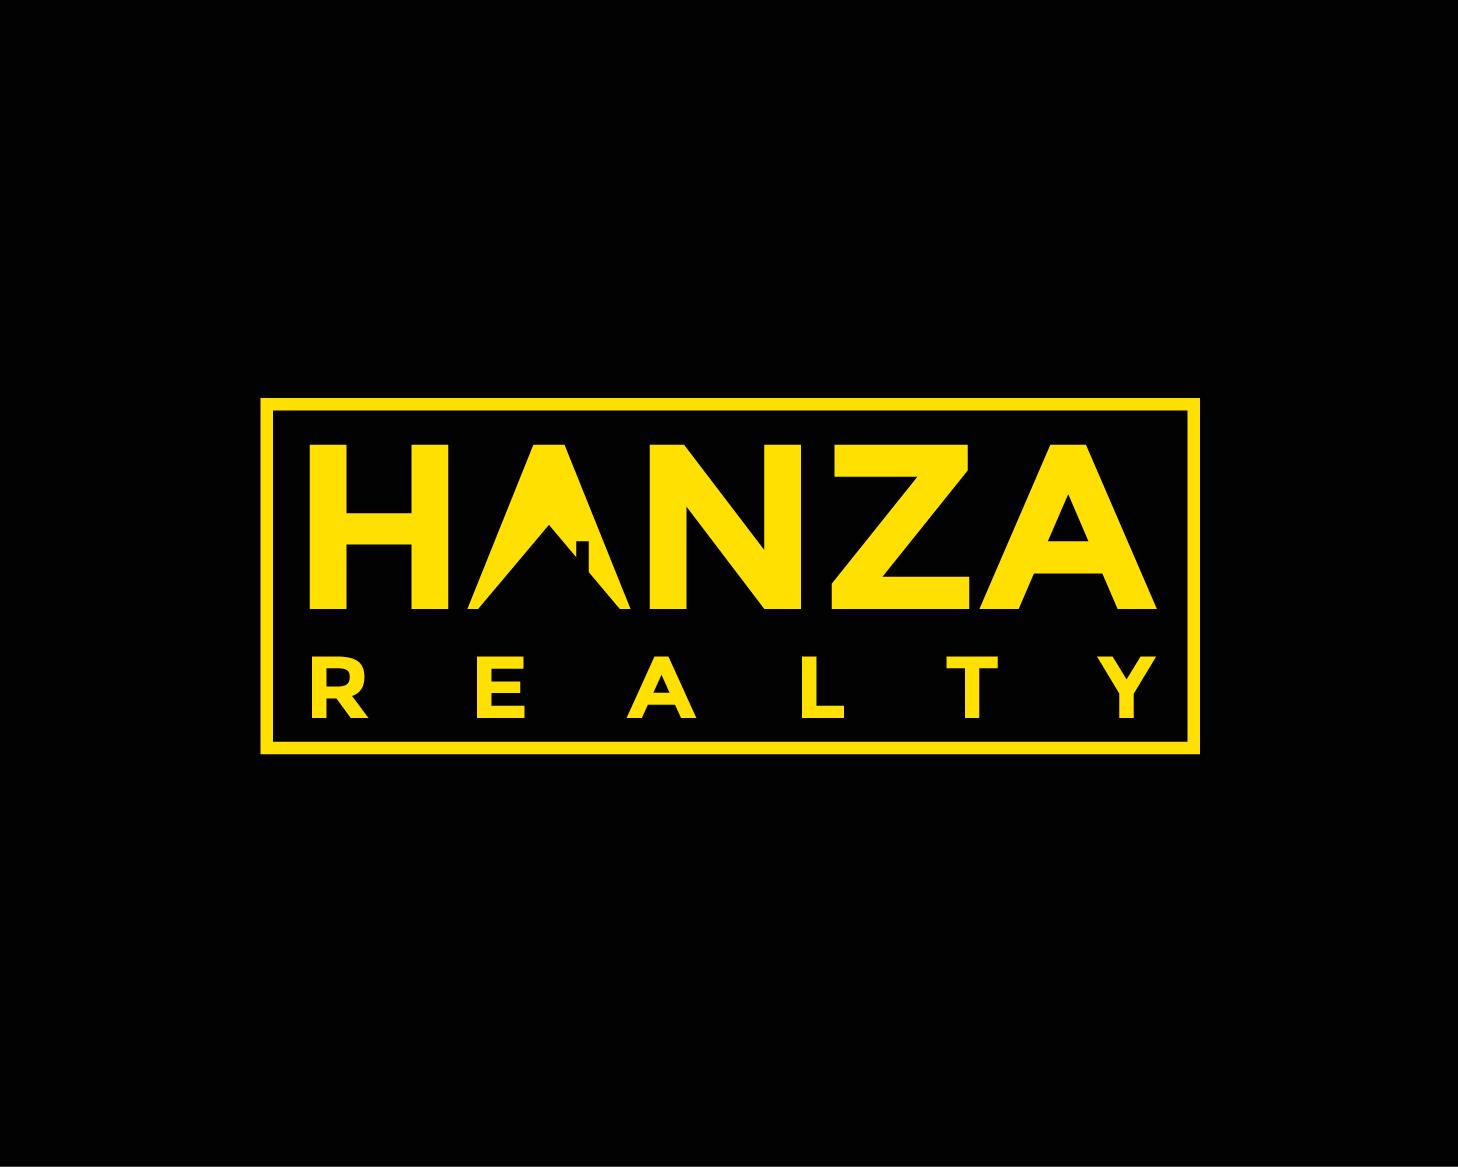 Logo Design by Allan Esclamado - Entry No. 9 in the Logo Design Contest Logo Design for Hanza Realty.